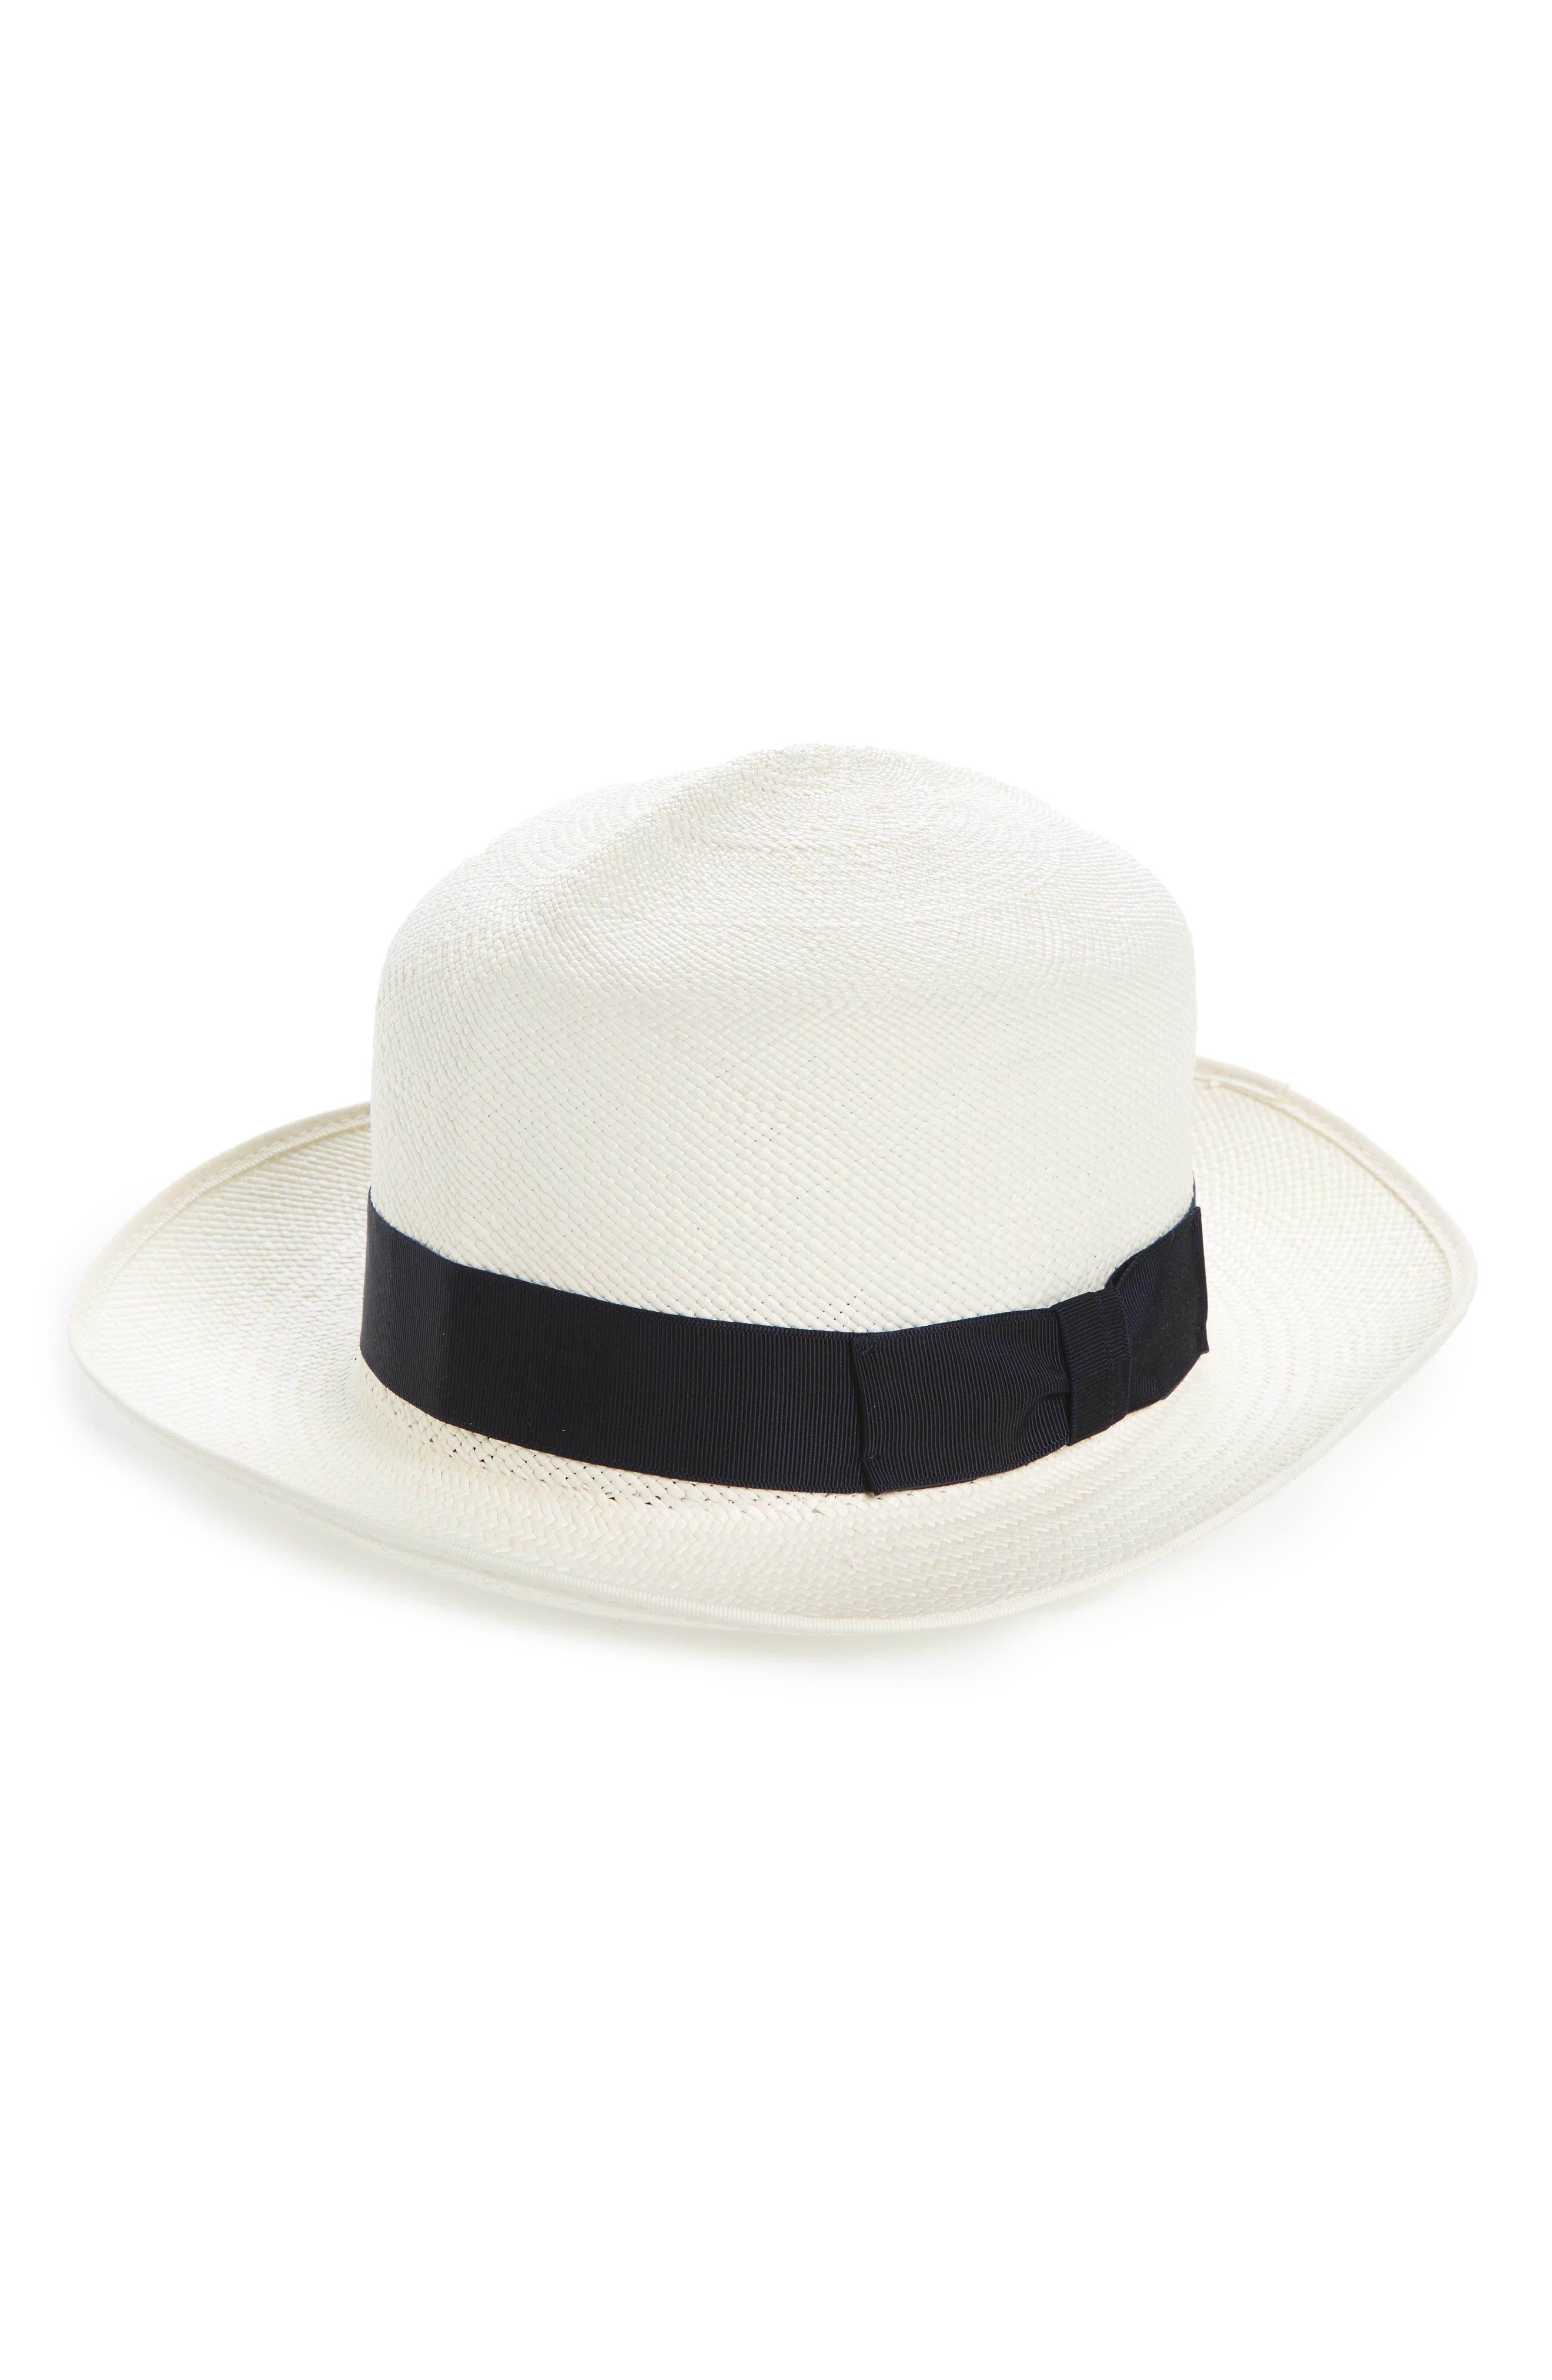 Main Image - Christy's Hats Folder Straw Panama Hat